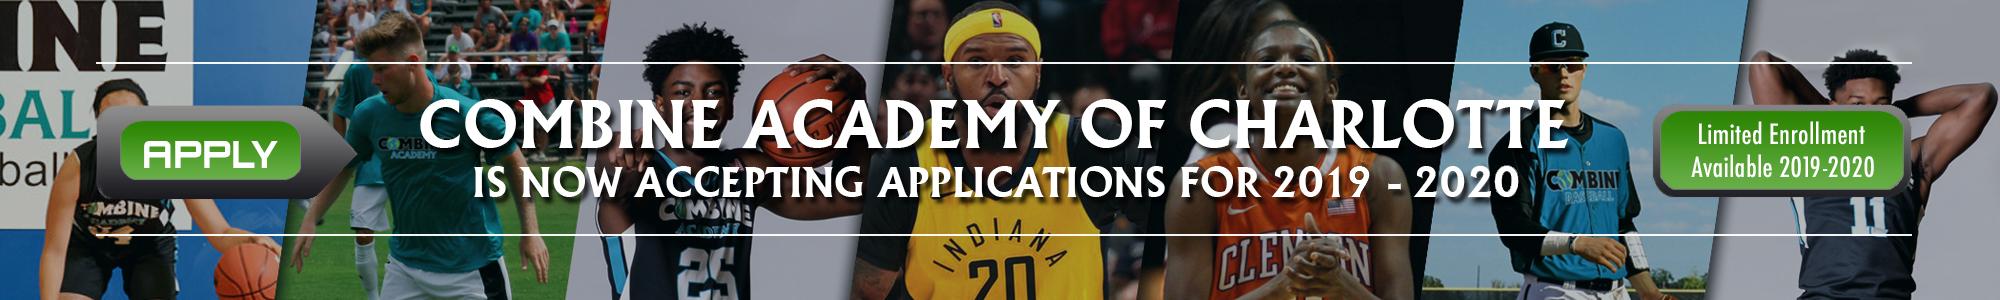 Combine Academy Apply Banner